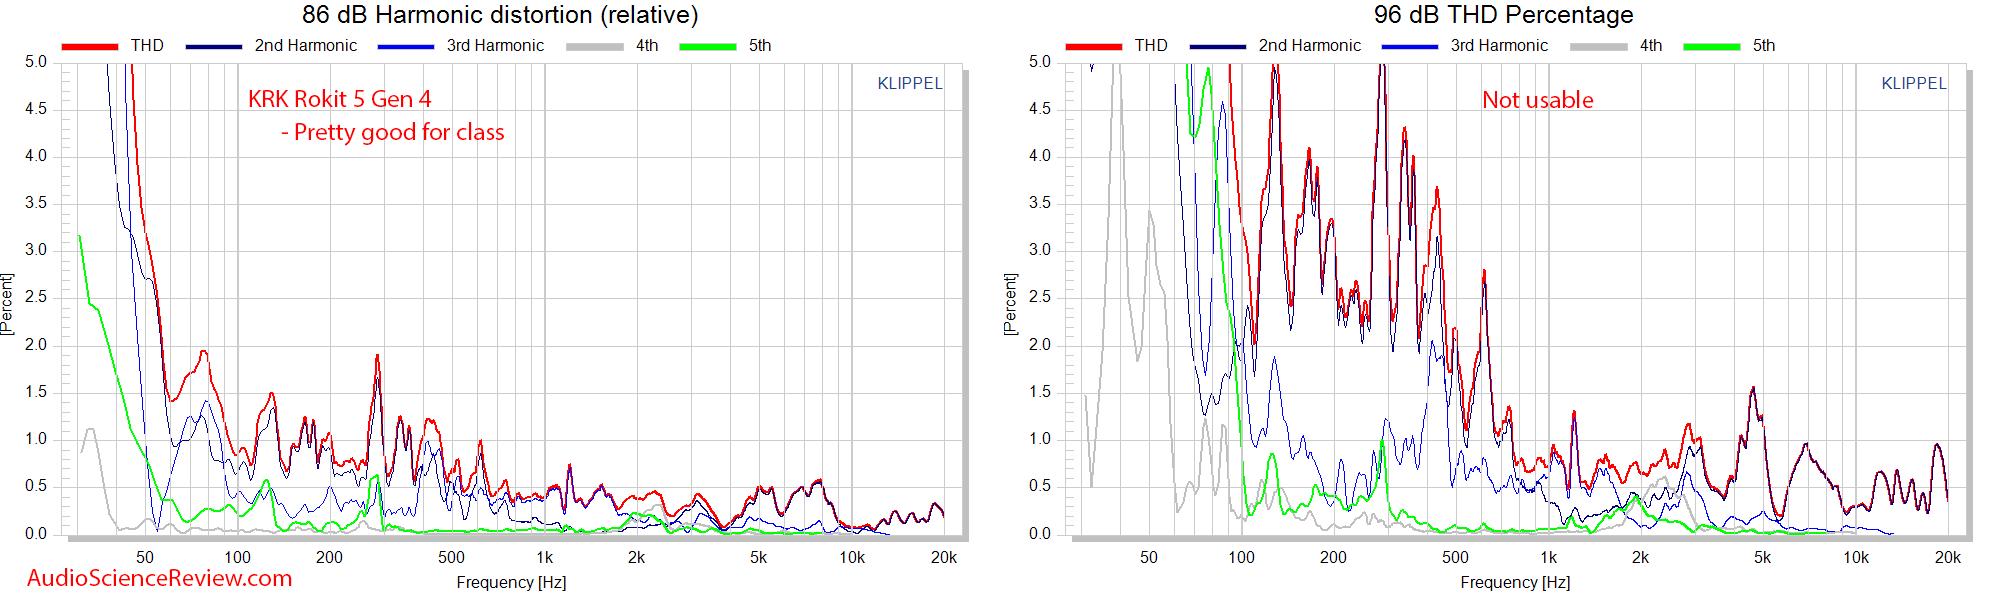 KRK RP5 Rokit G4 Measurements relative distortion.png